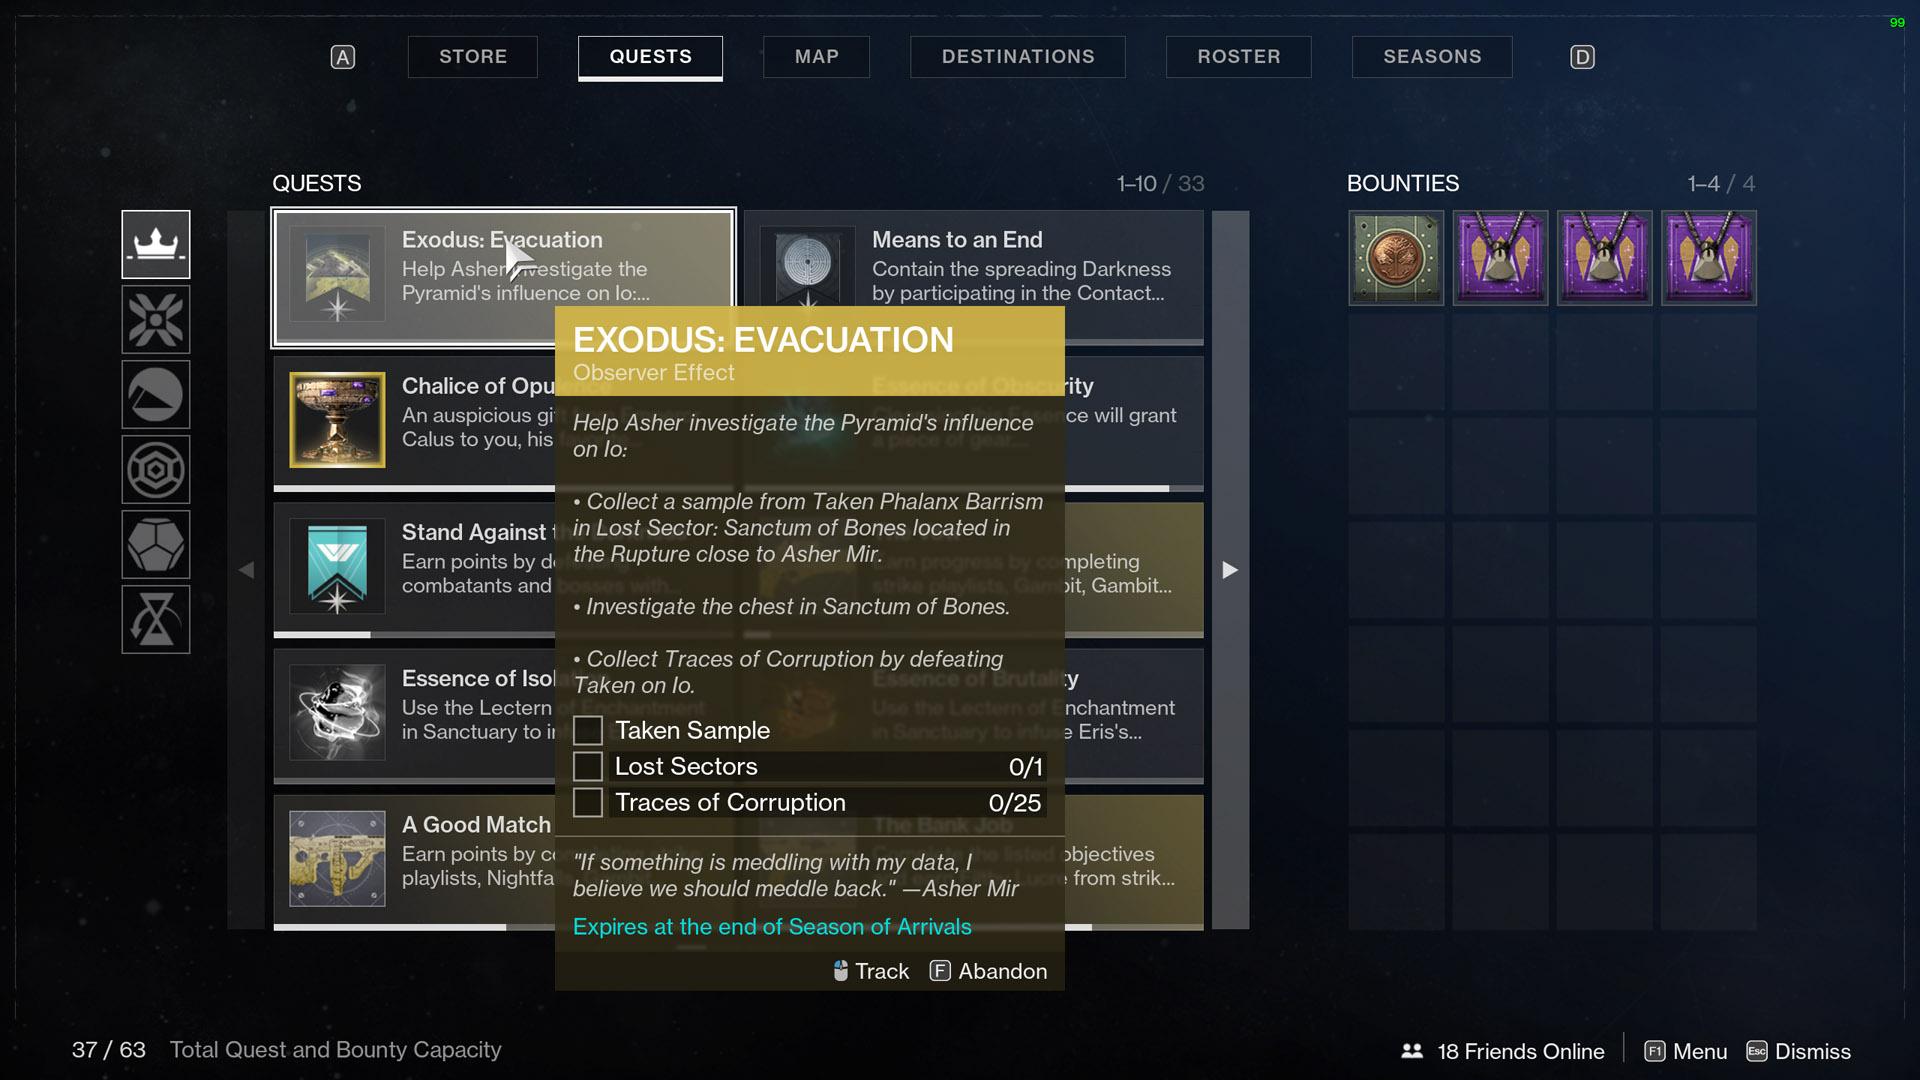 Destiny 2 Exodus Evacuation Observer Effect